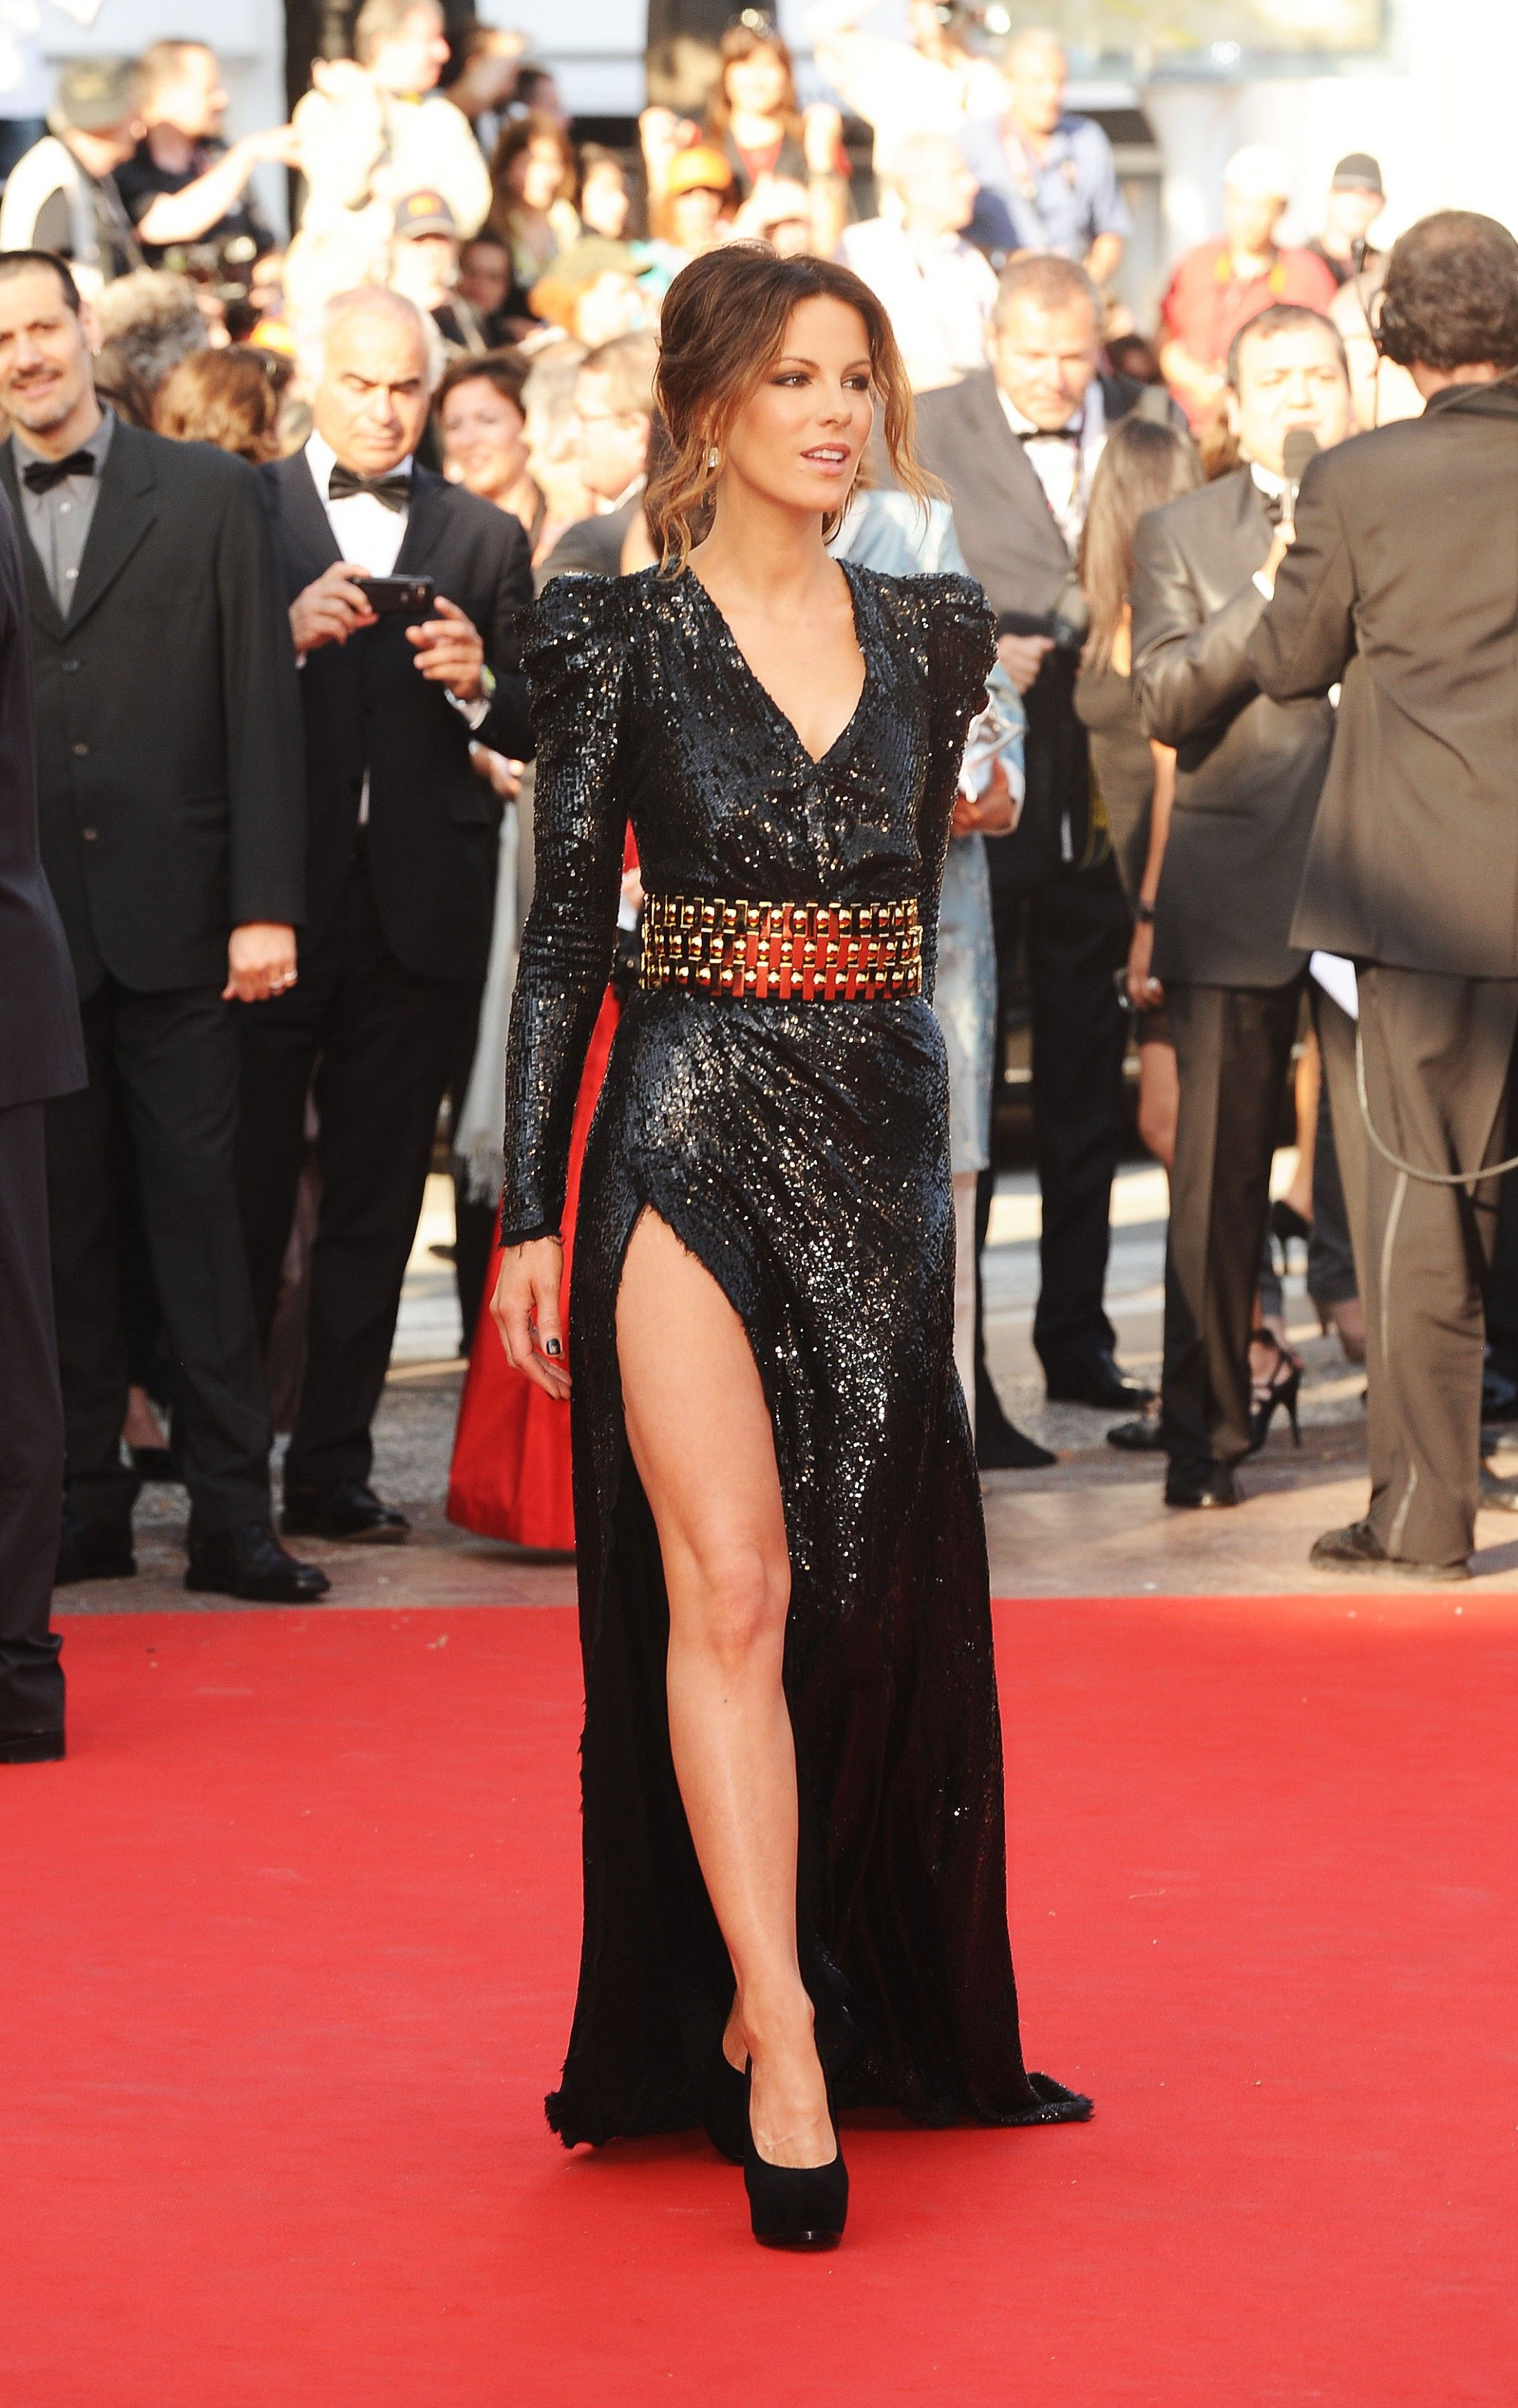 Kate Beckinsale - she's so great!